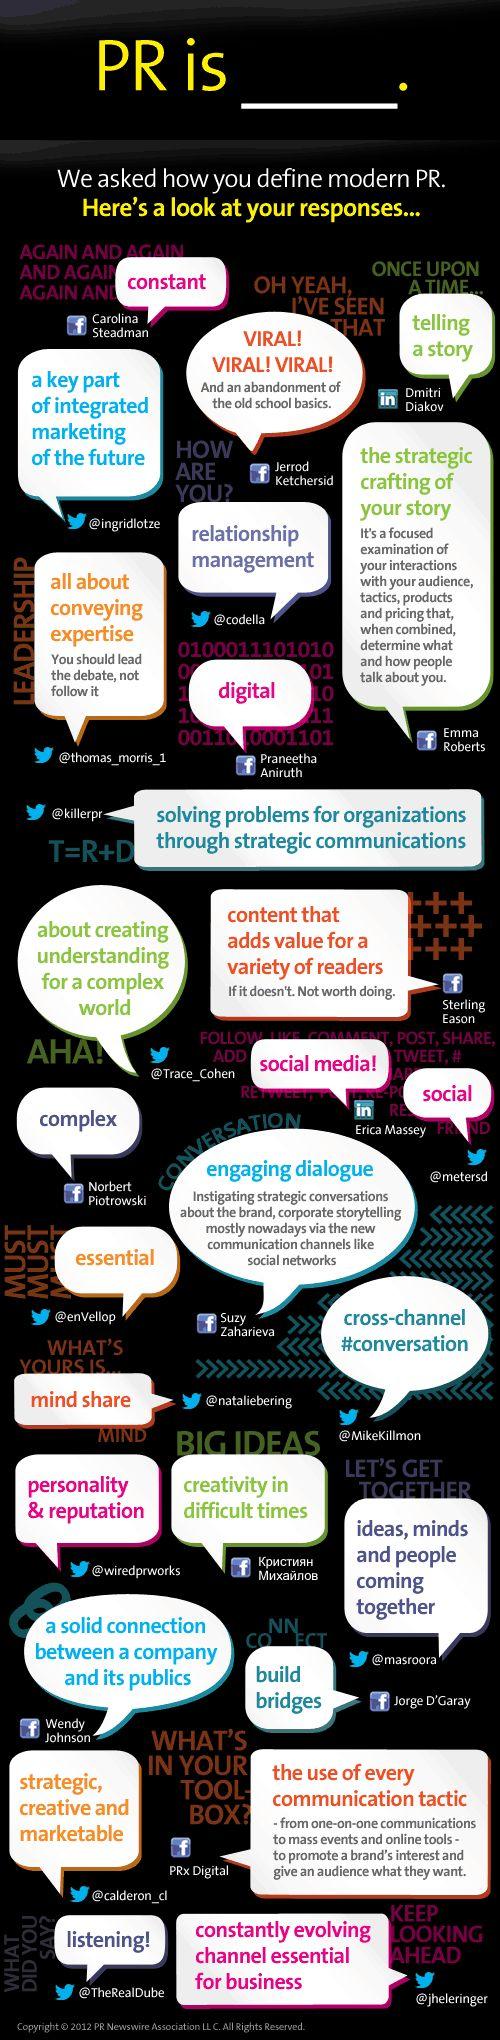 How you define modern PR #infographic